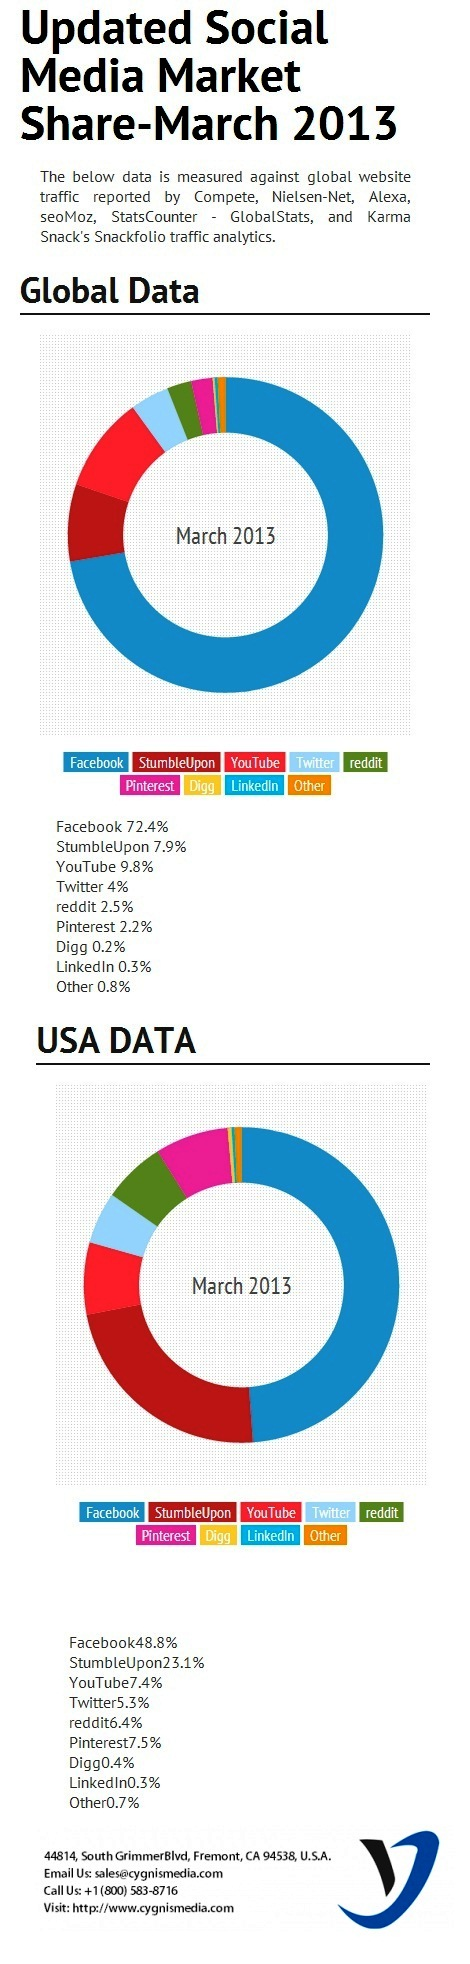 social-media-market-share-2013-infographic_5211ec101729b